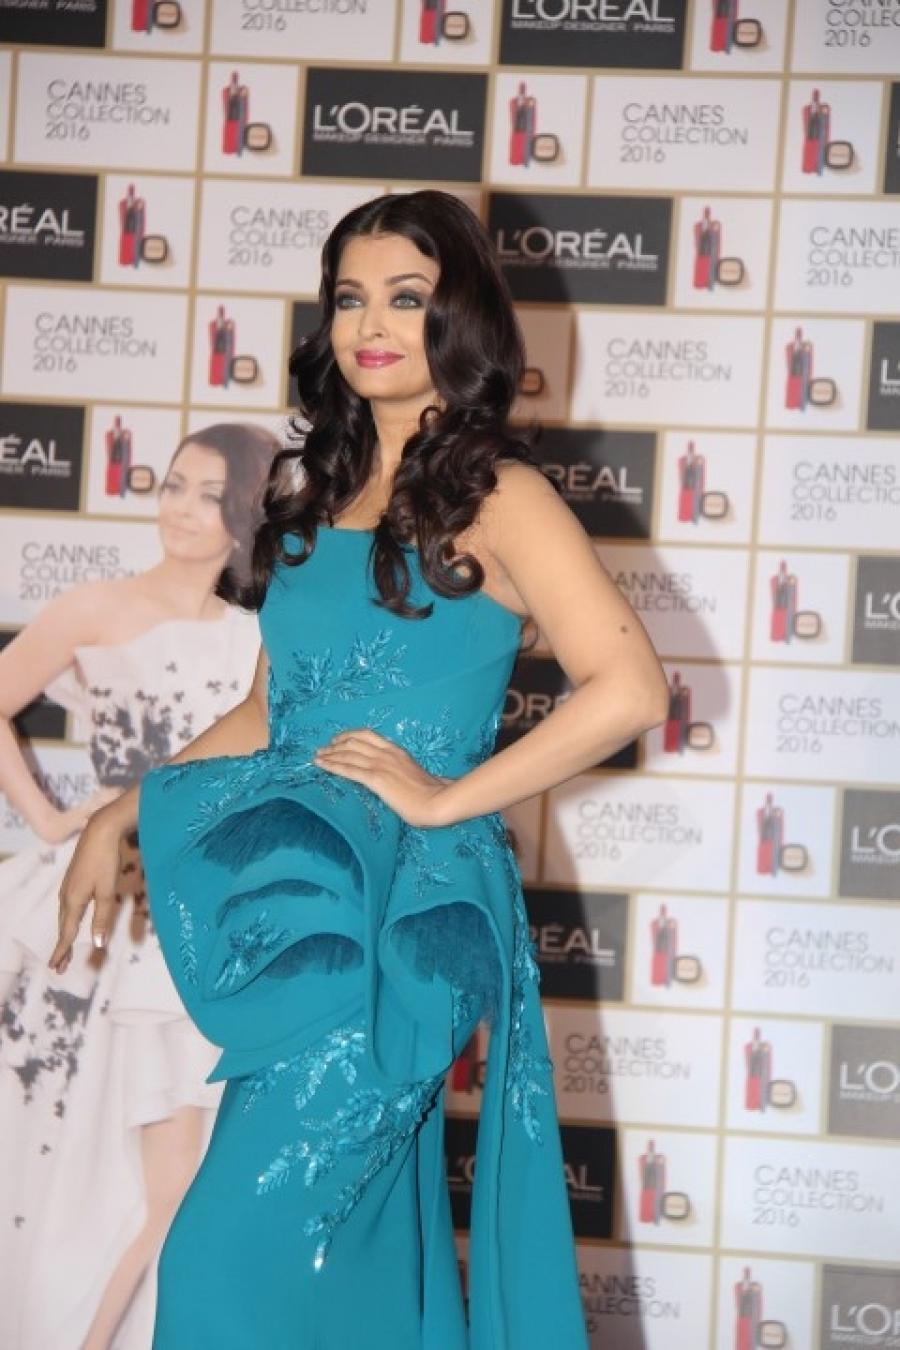 Aishwarya Rai Photos In Blue Dress At an Event